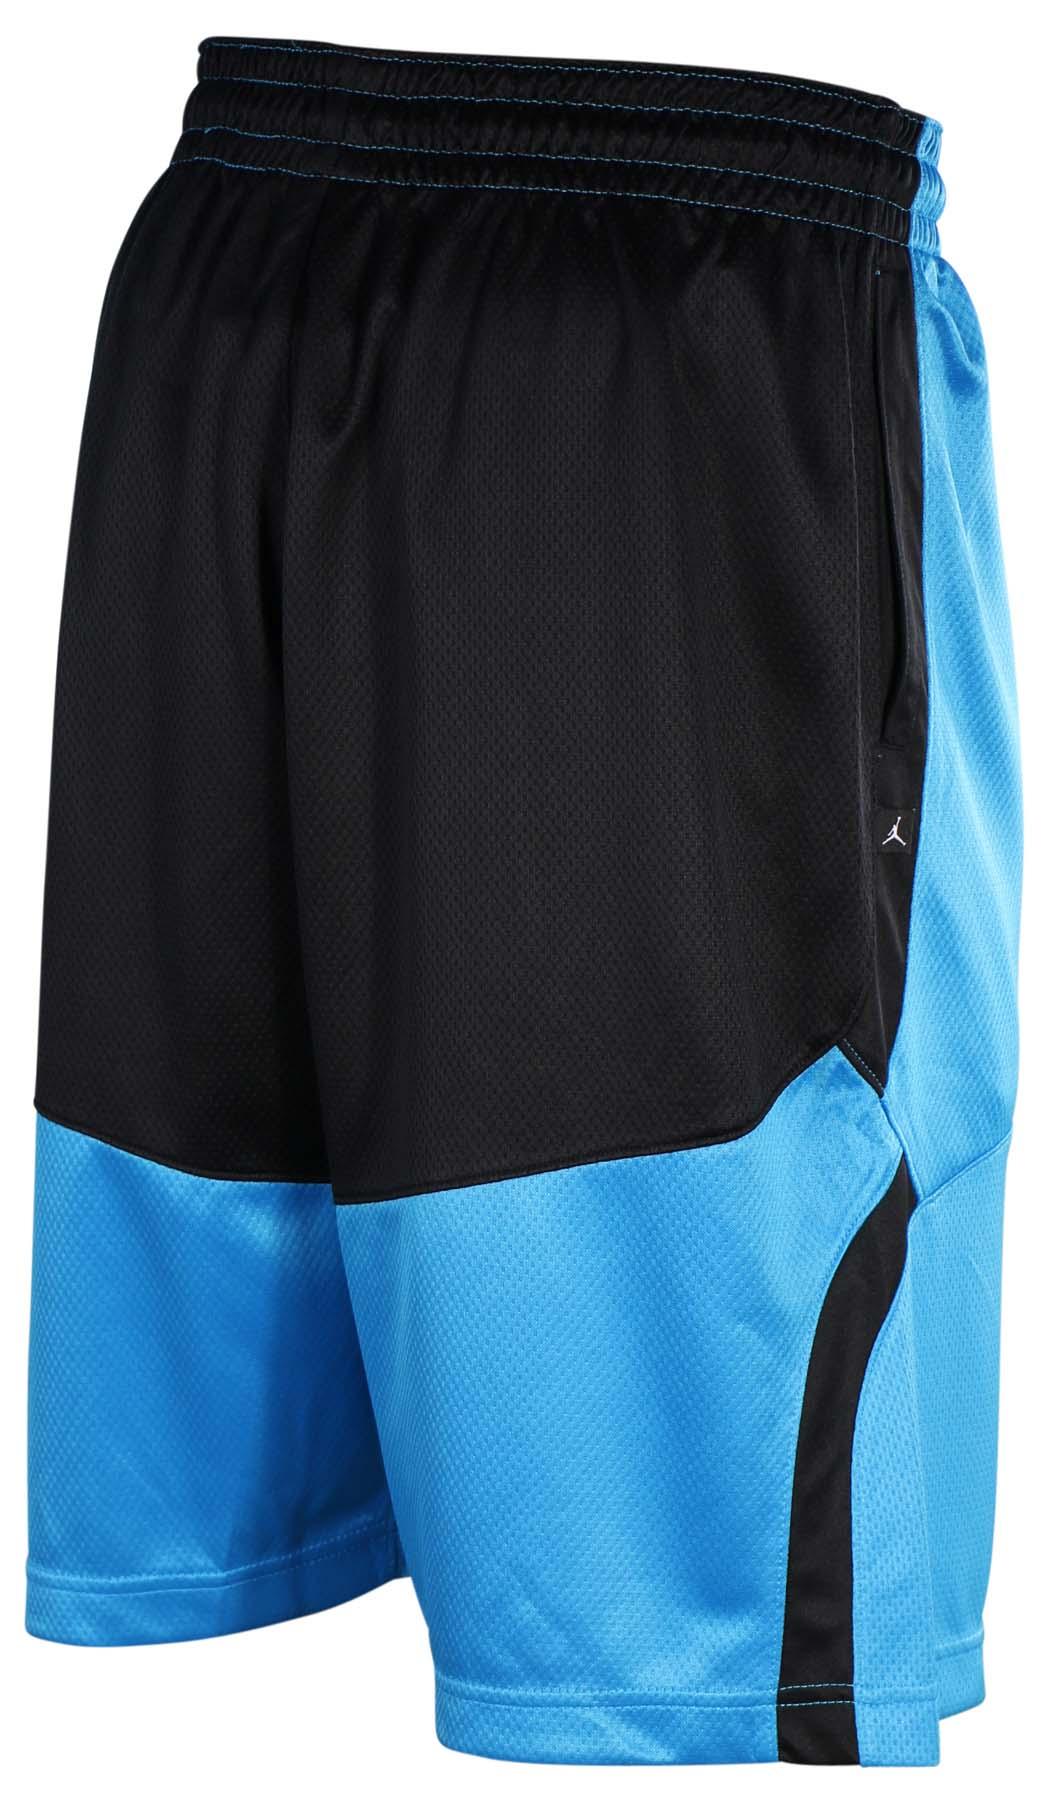 jordan men 39 s nike dri fit flight basketball shorts ebay. Black Bedroom Furniture Sets. Home Design Ideas